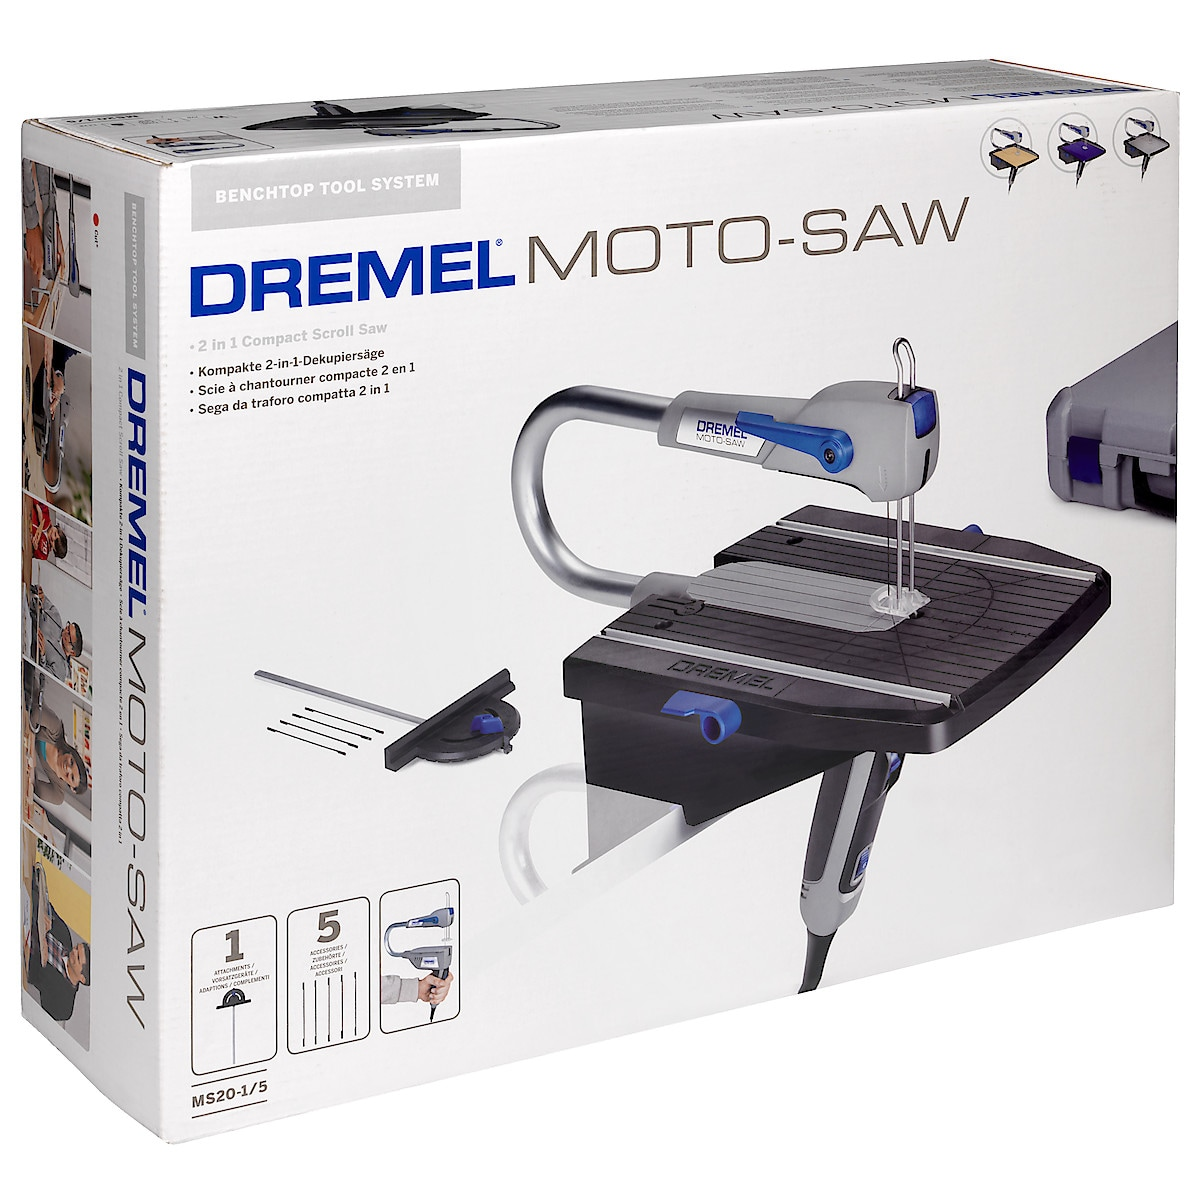 Figursåg Dremel Moto-Saw